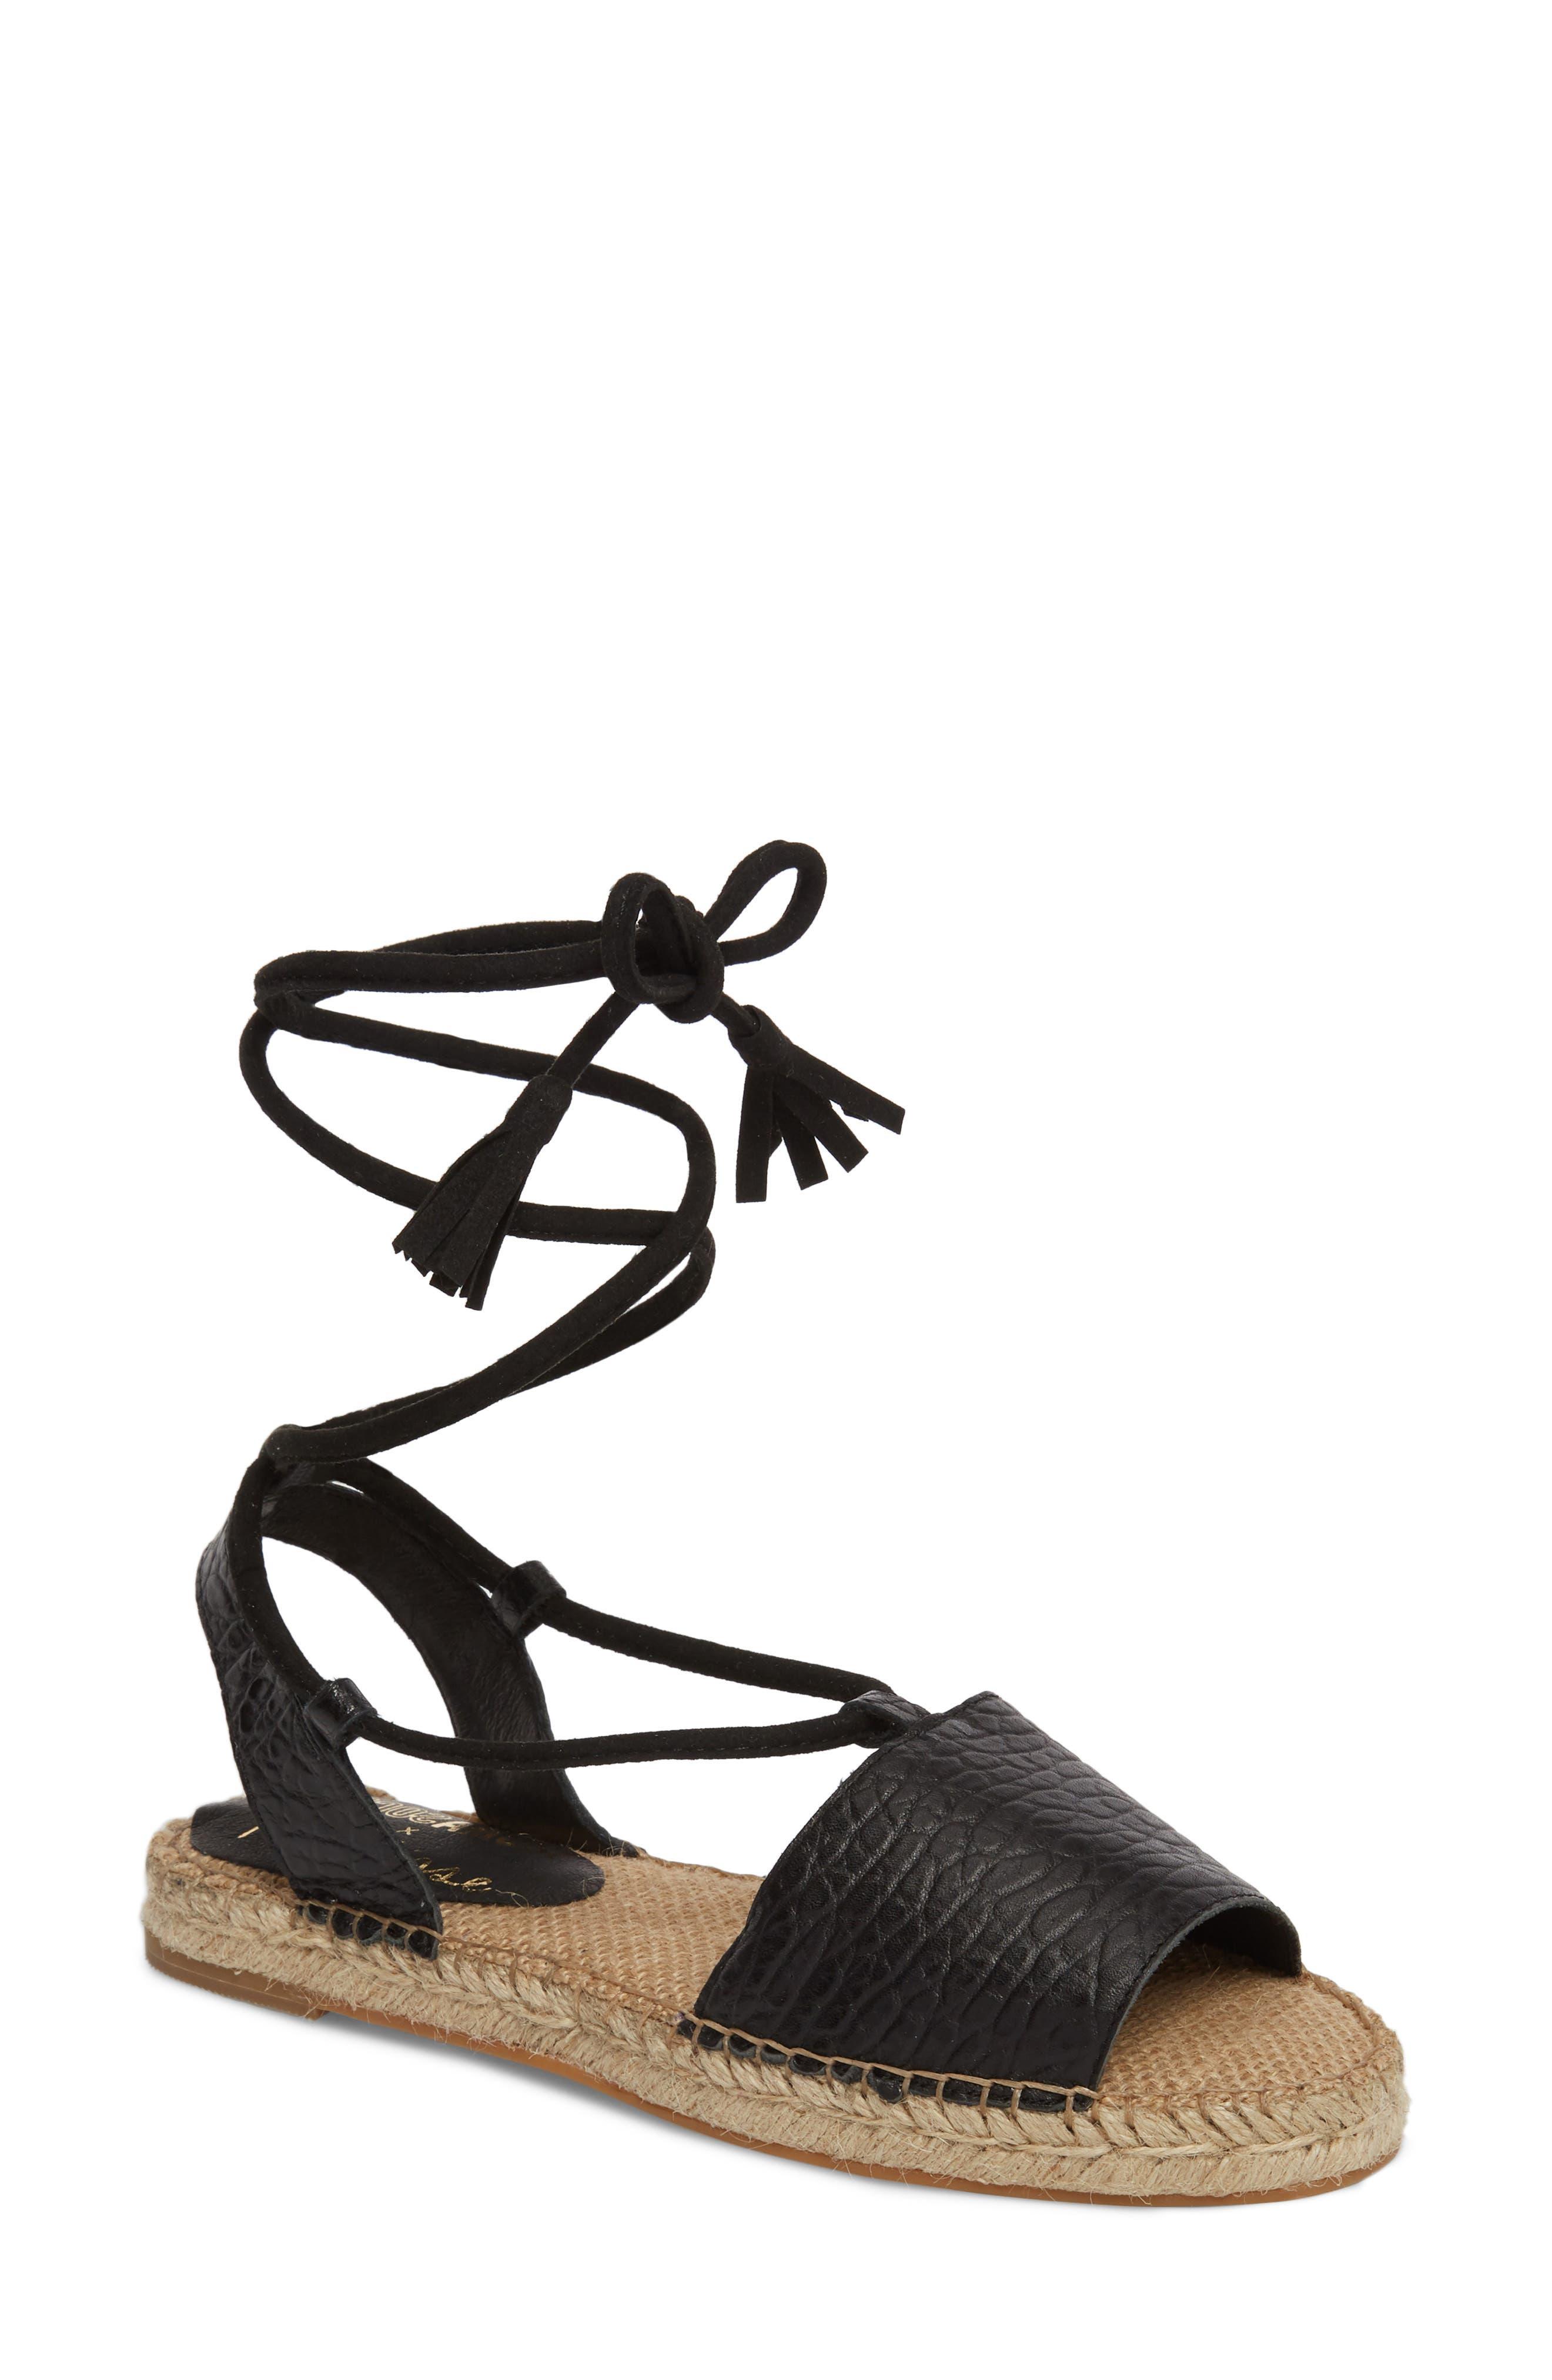 Amuse Society X Matisse La Vita Sandal